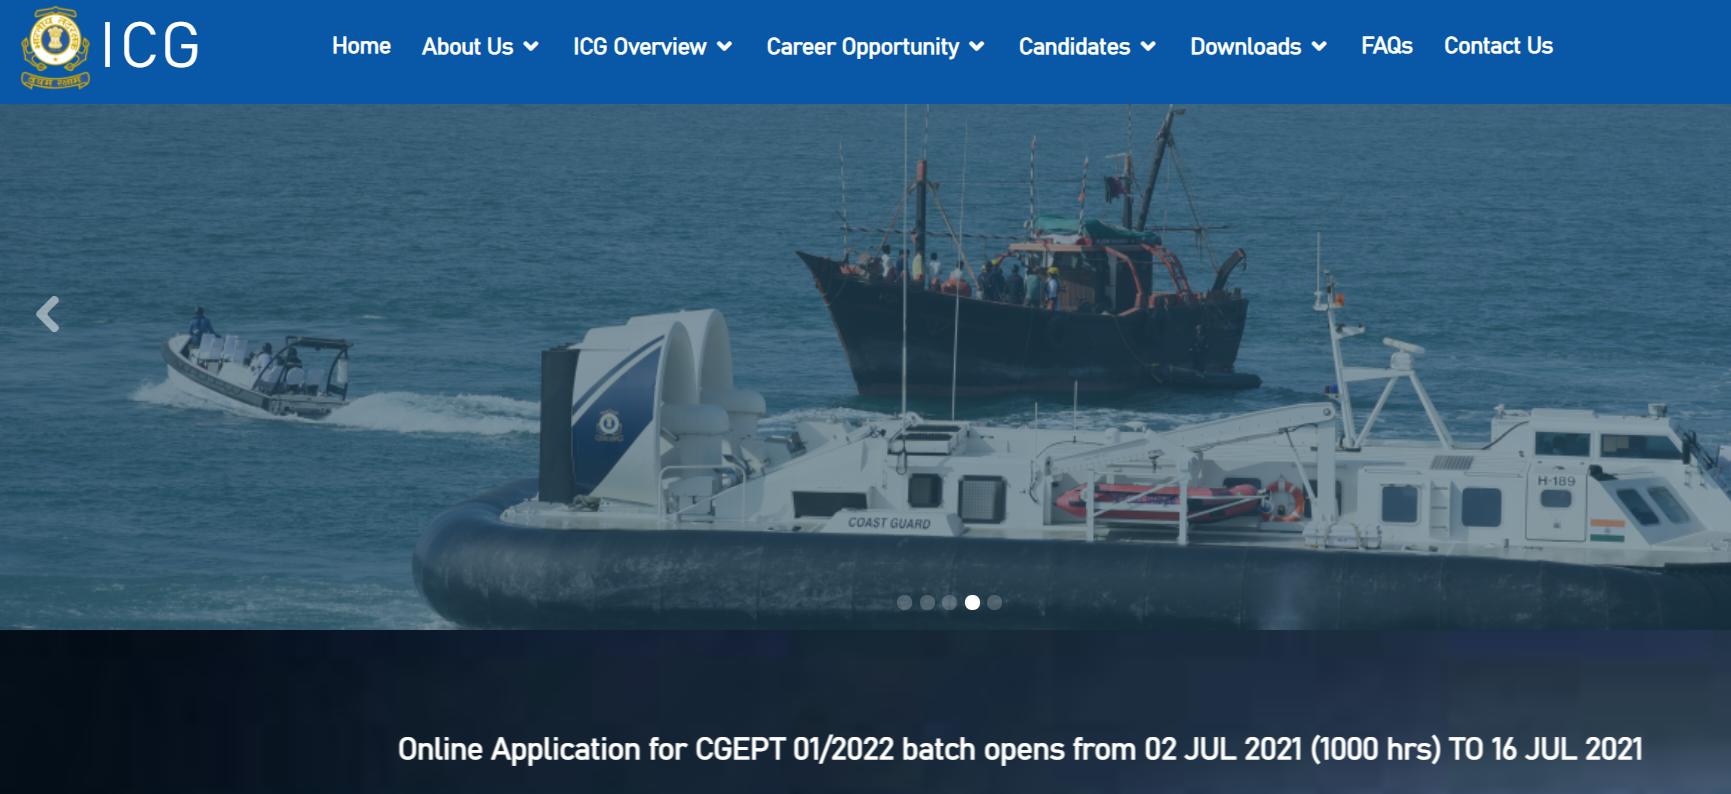 Indian Coast Guard Recruitment 2021 | Apply Online for 350 Navik, Yantrik Vacancy, Notification PDF